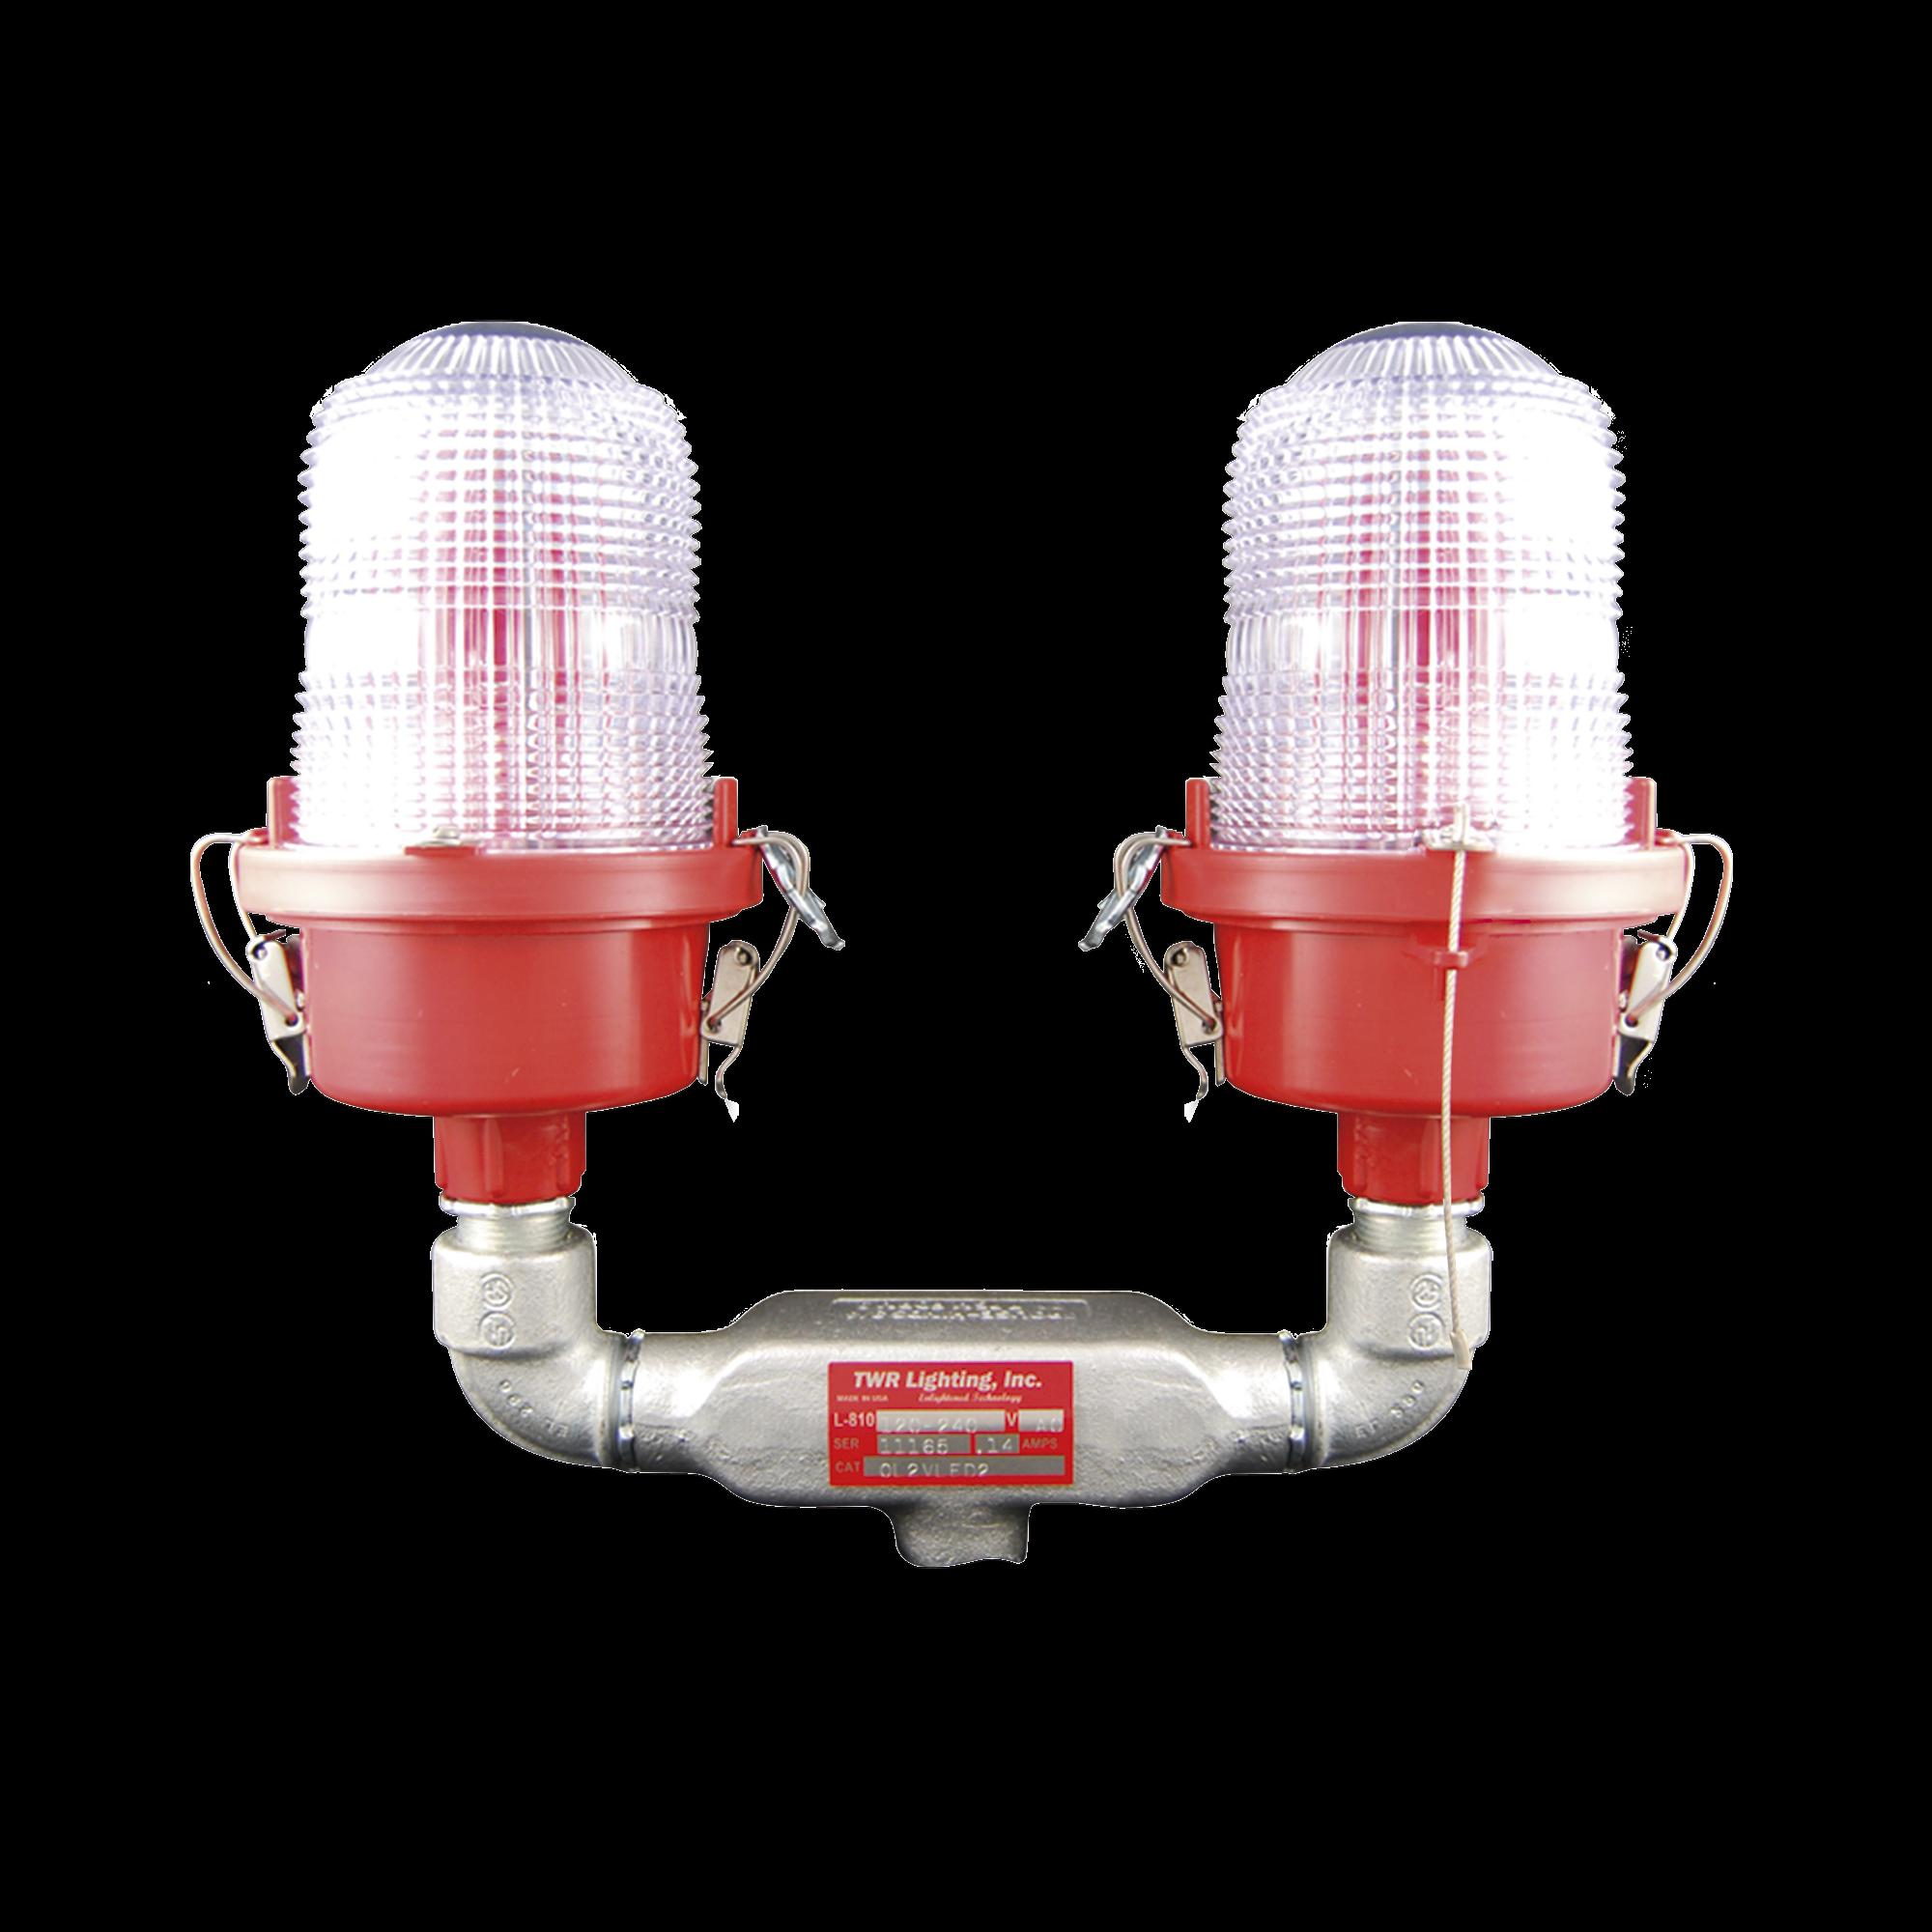 Lámpara de Obstrucción Roja, Tipo L-810, de Doble LED  (120 - 240 Vca).